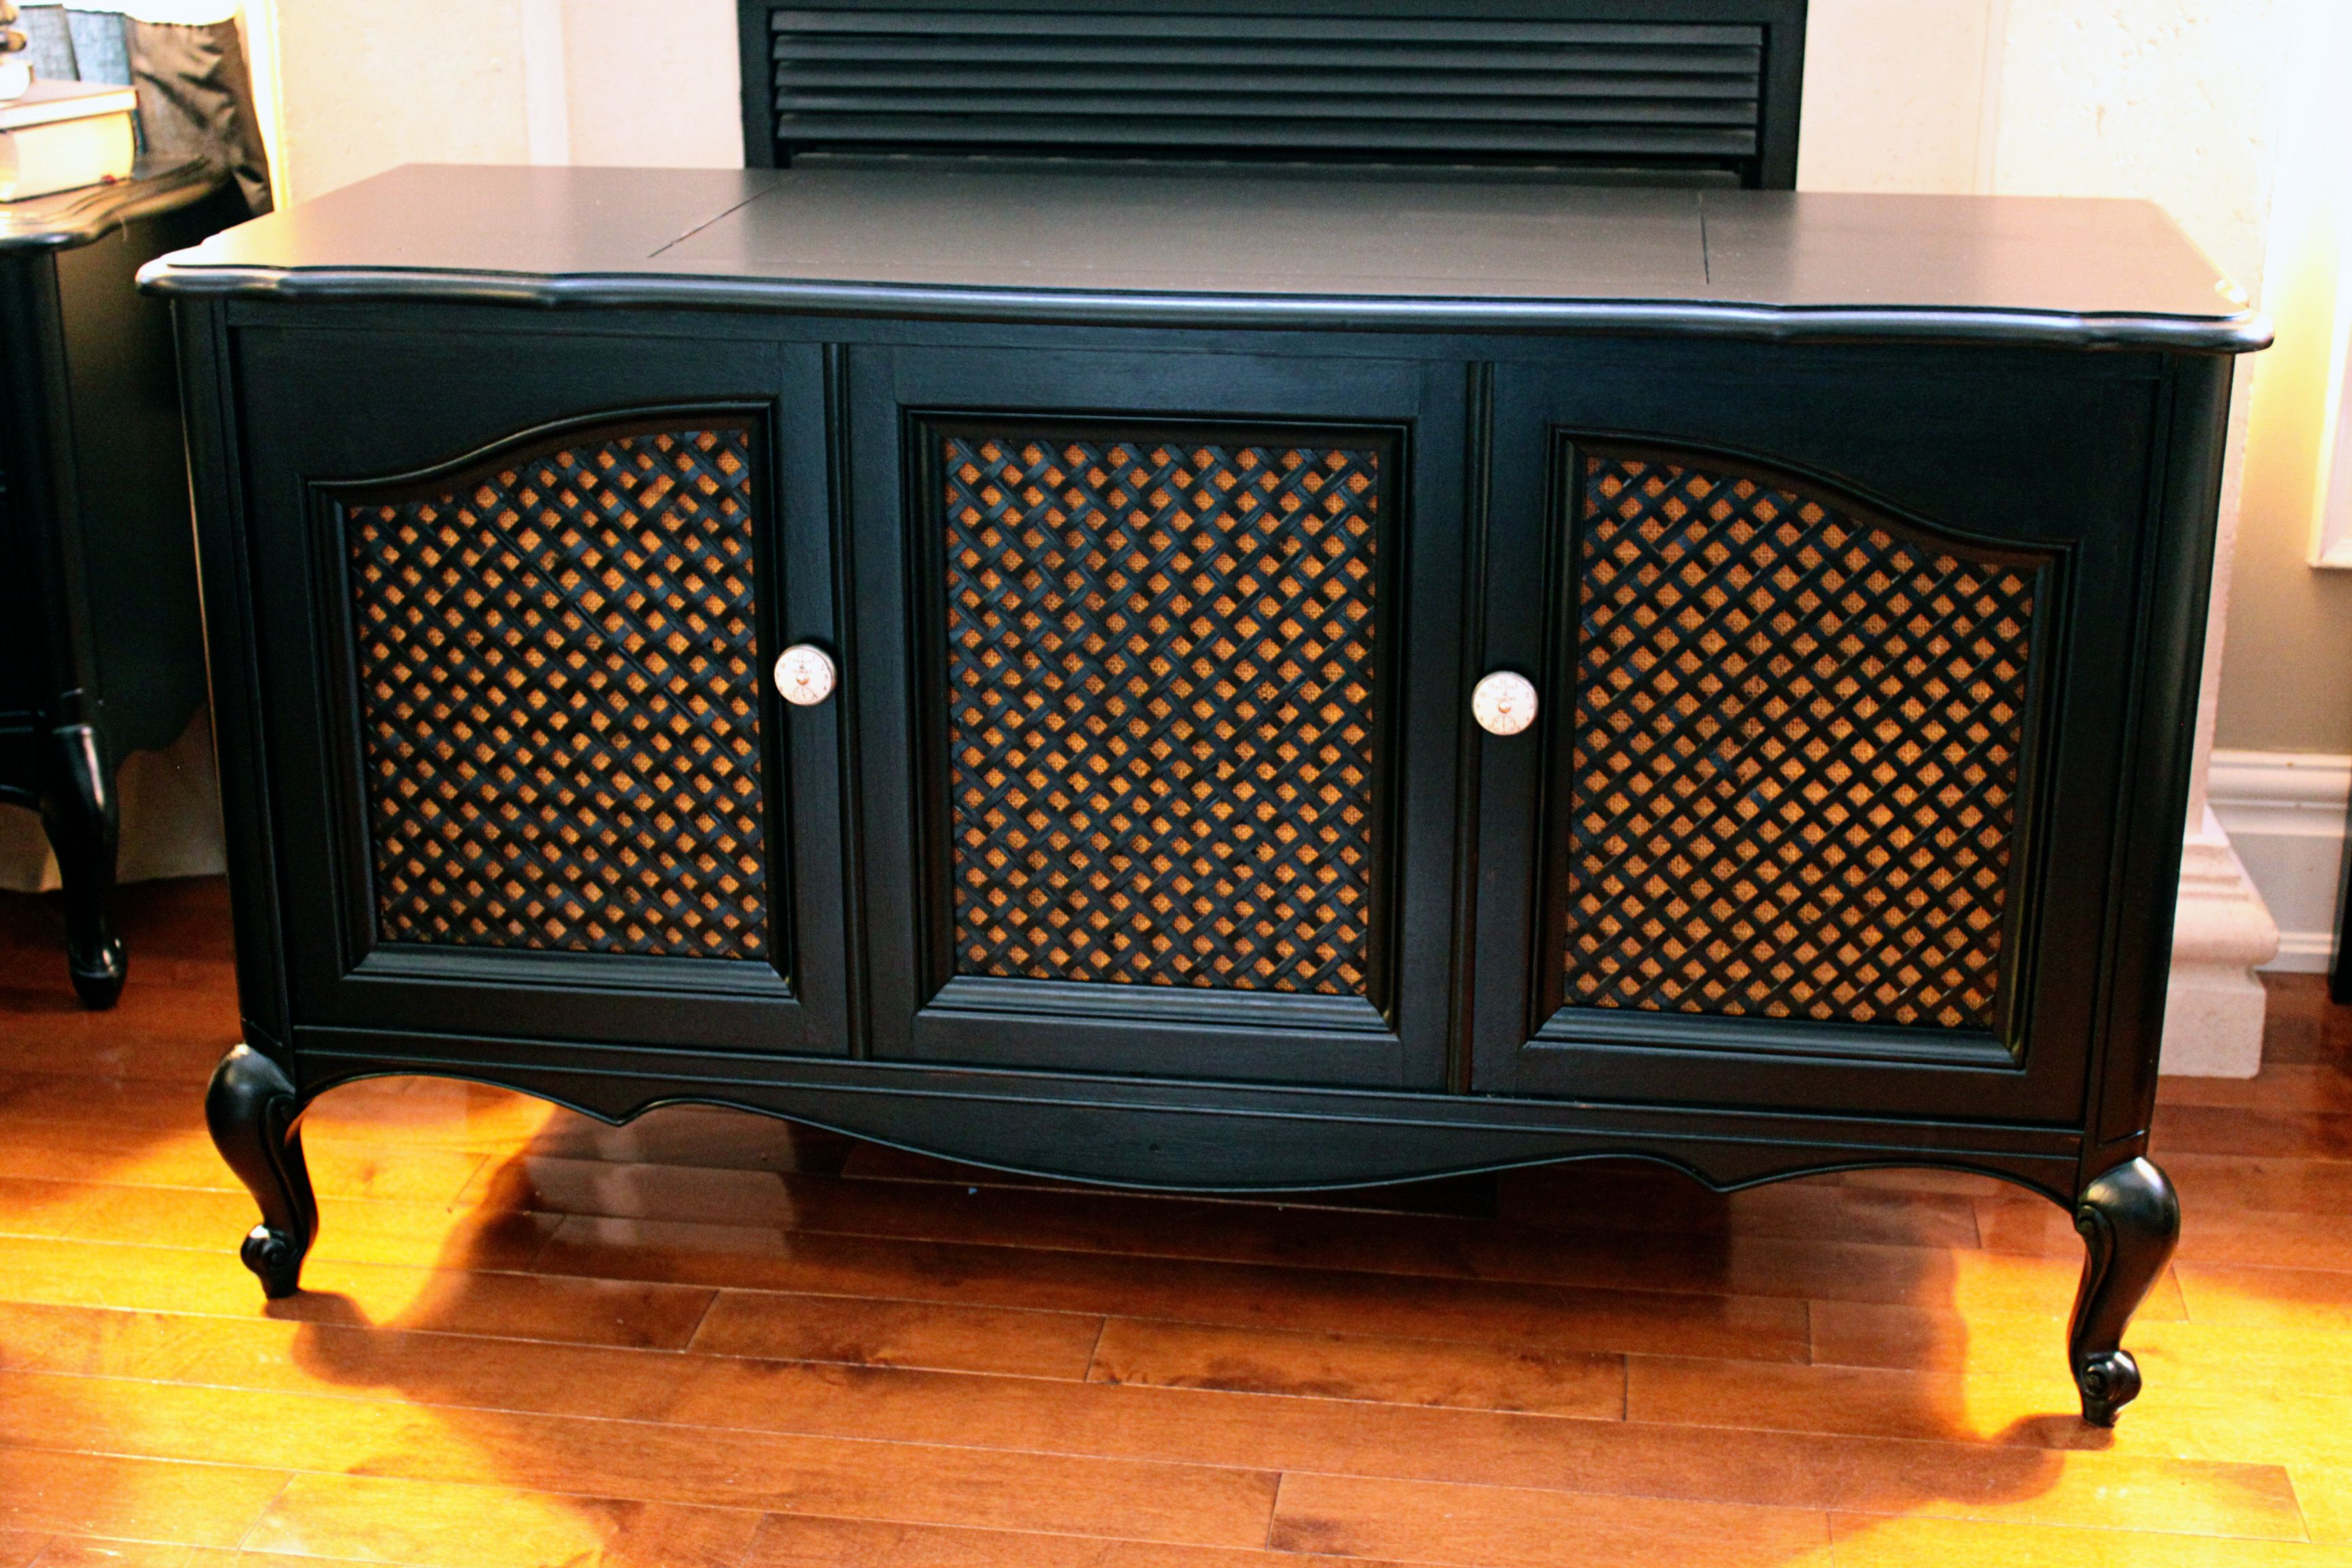 retrofit console diyscoveries pin pinterest cabinet vintage stereo